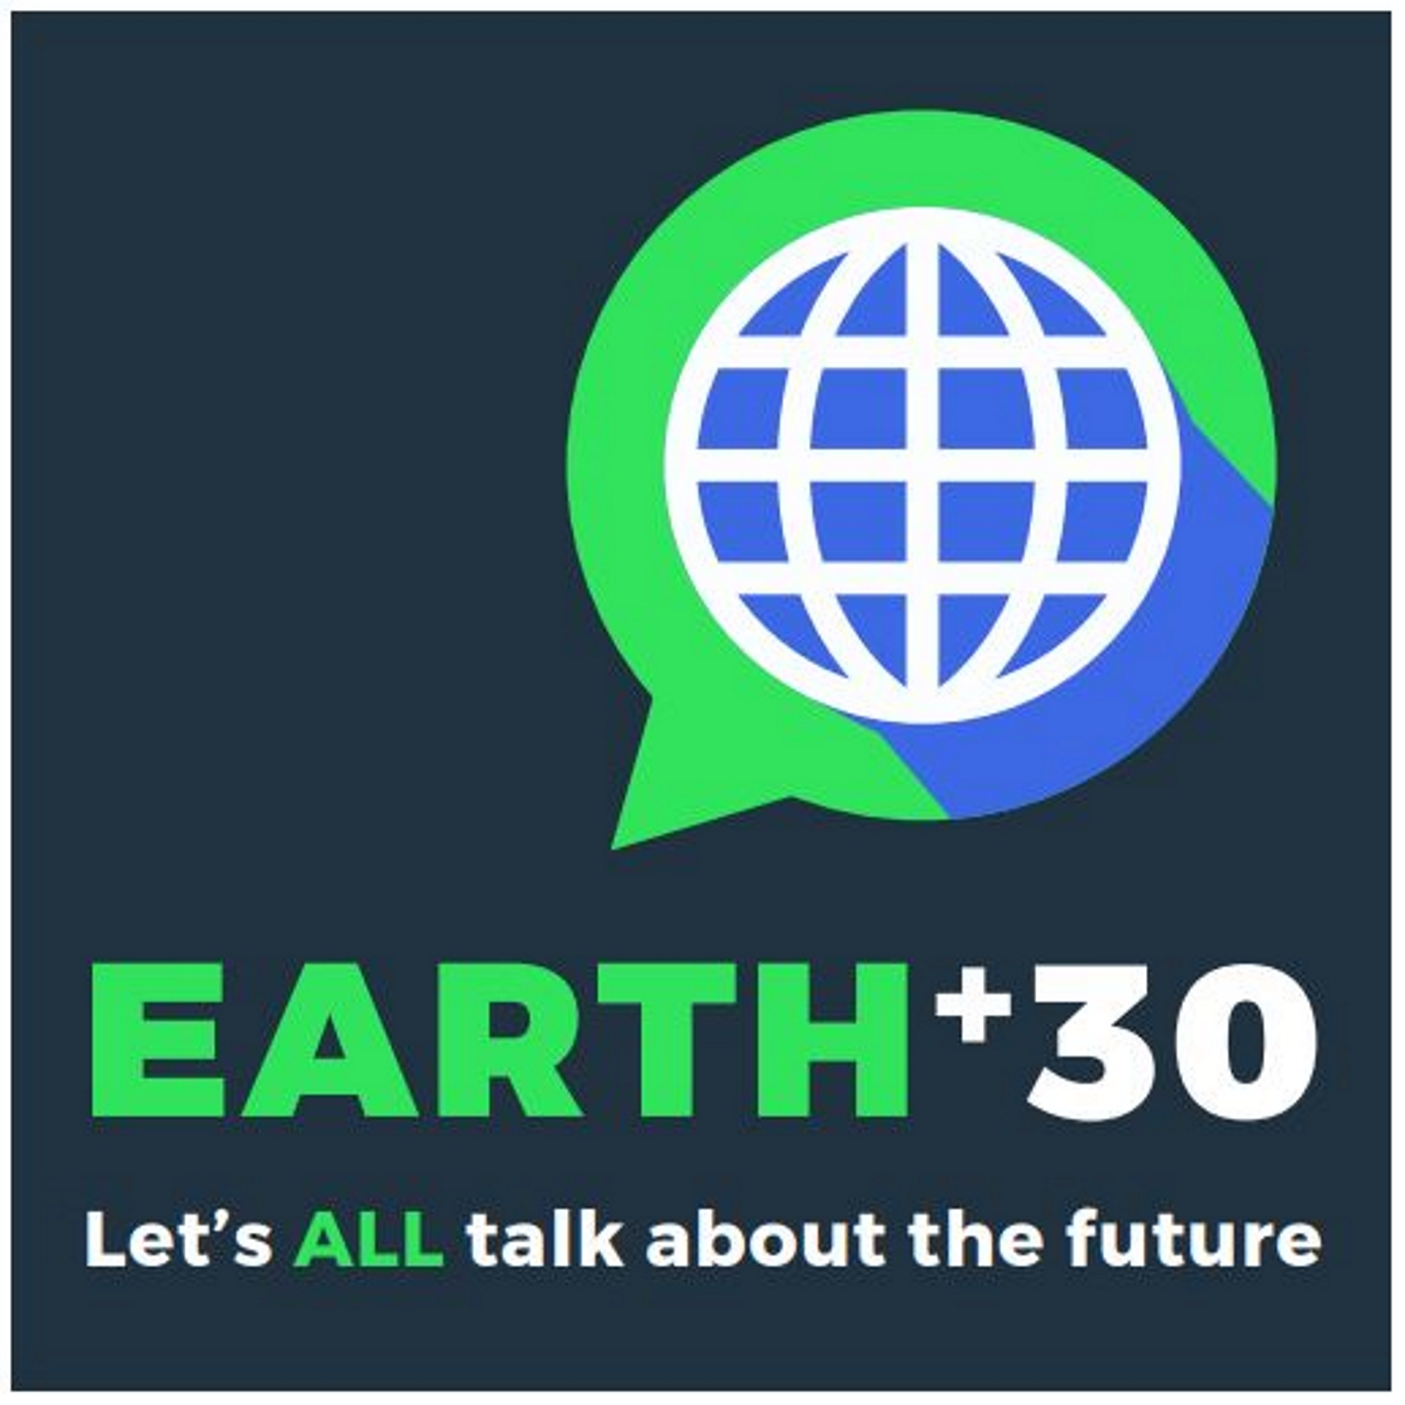 Artwork for podcast Earth+30